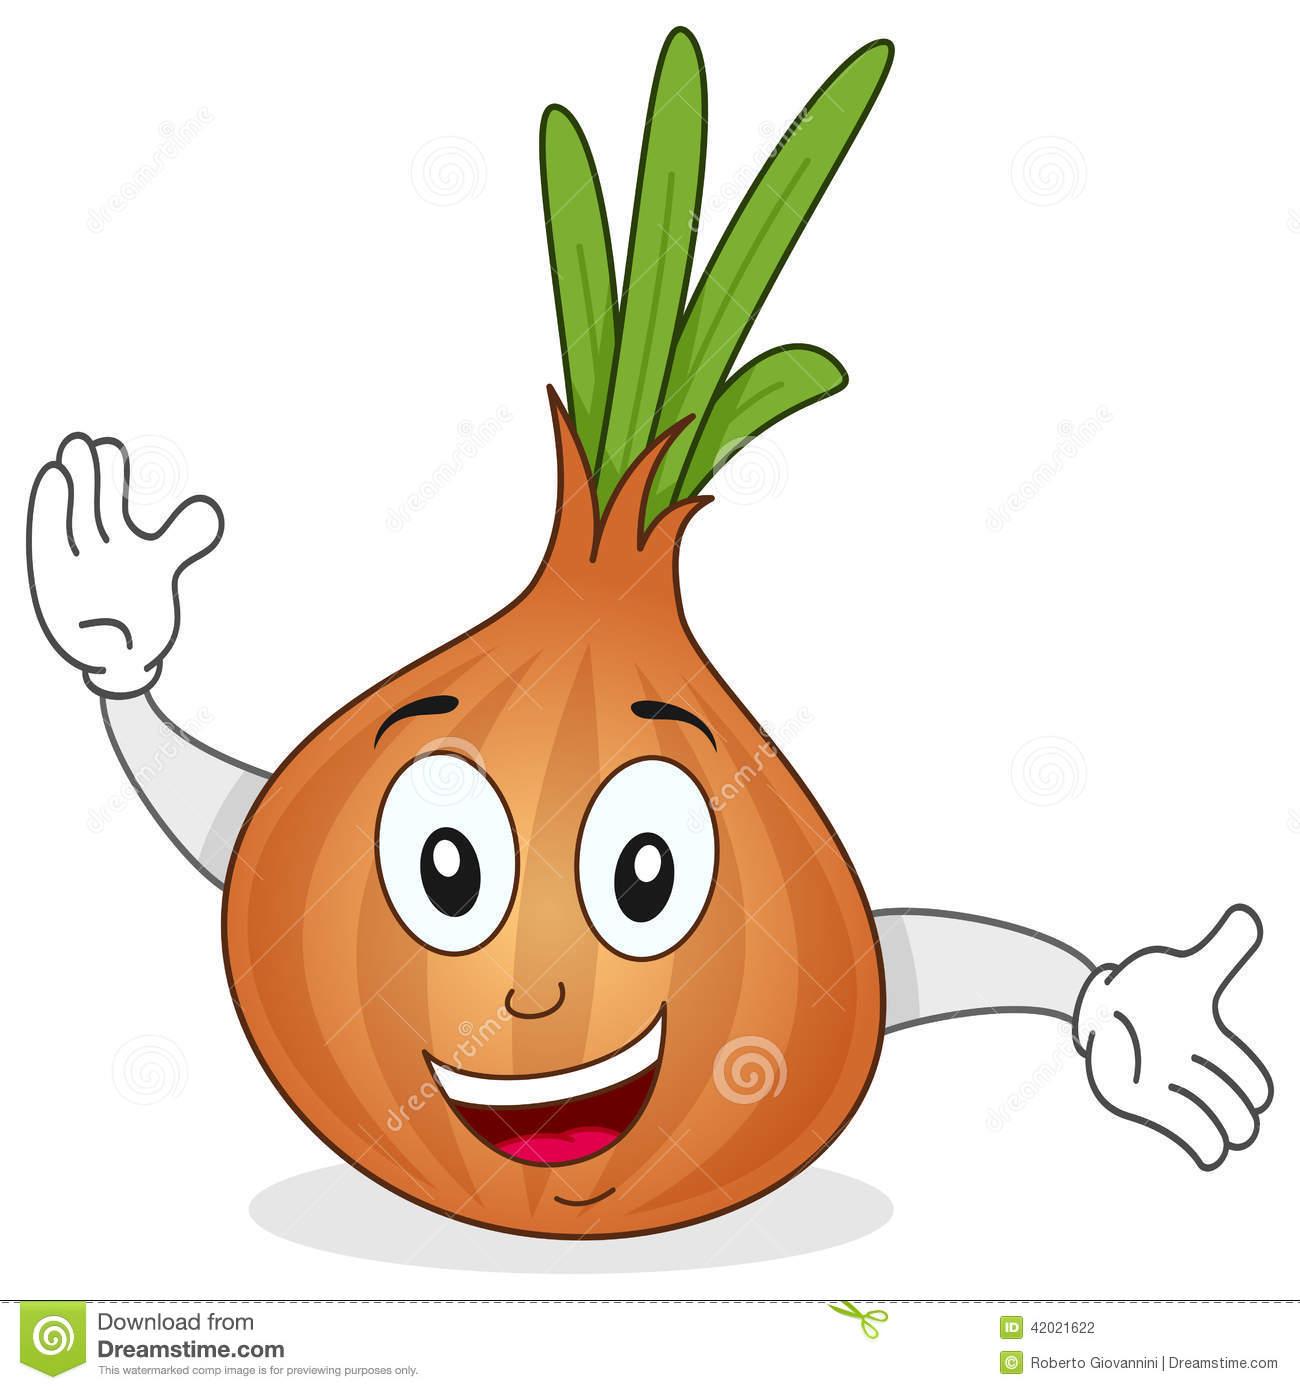 Cartoon Onion Clipart - Clipart Suggest